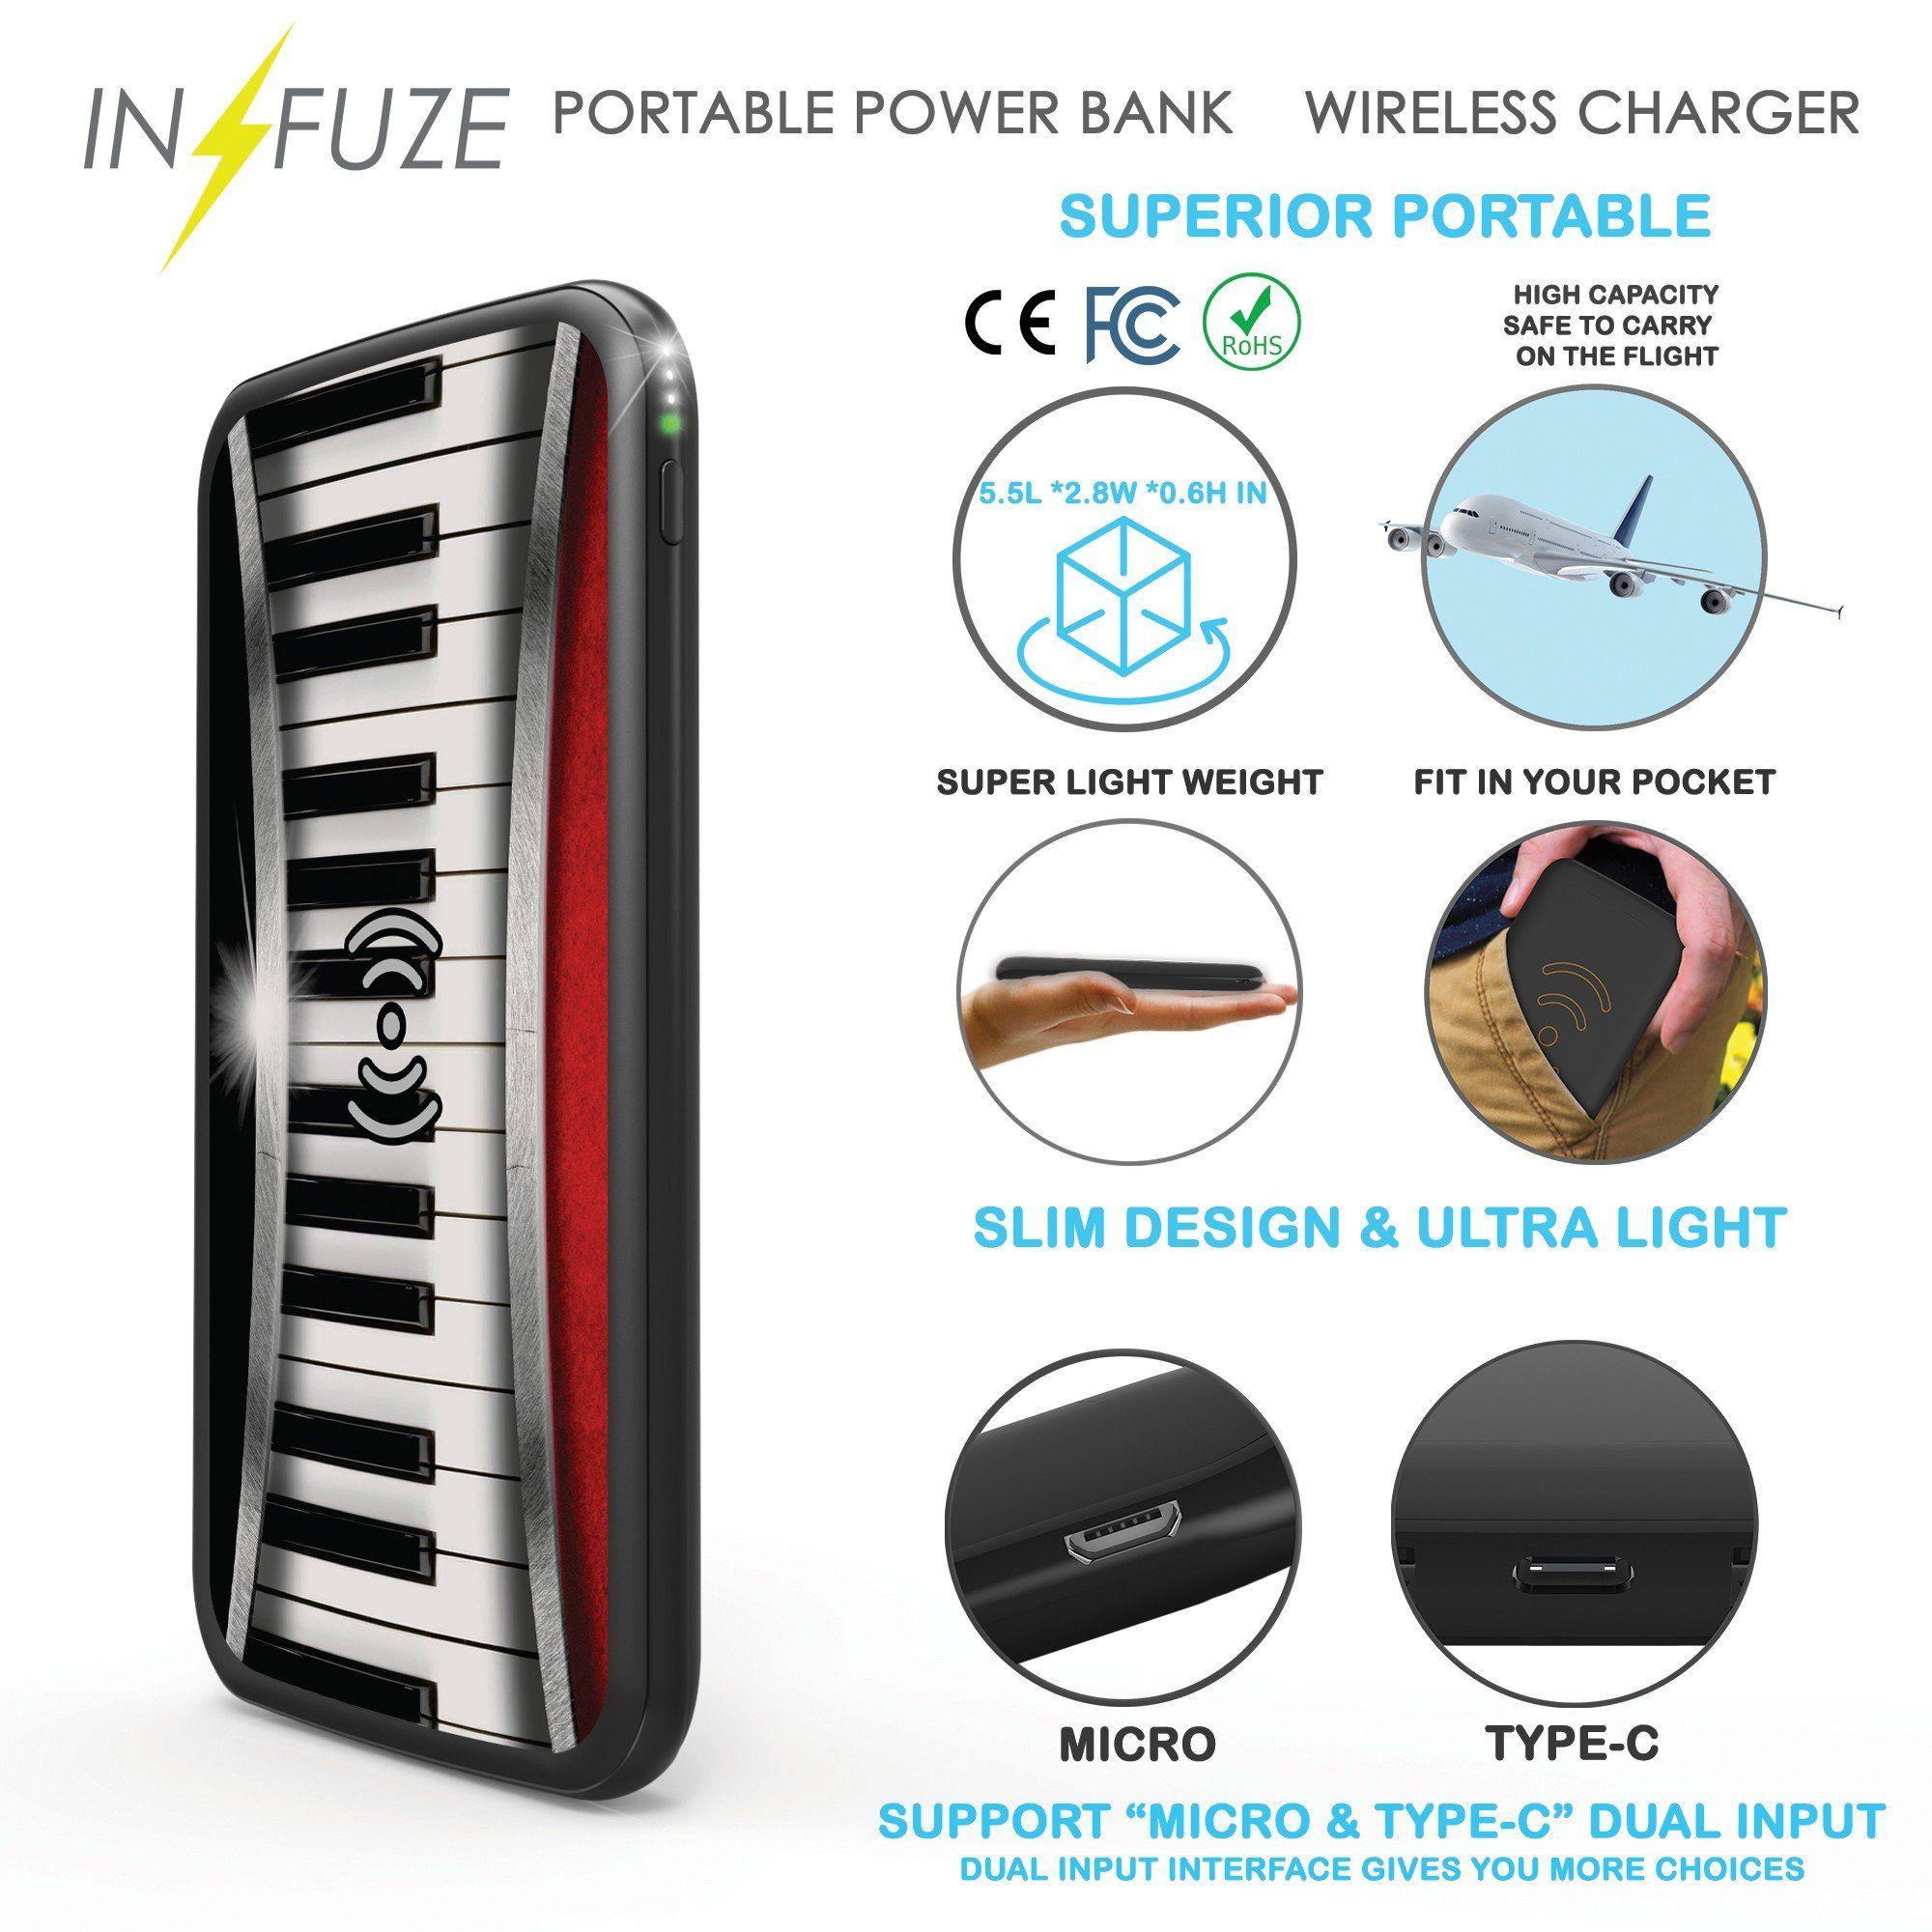 Portable powerbank infuze 10000mah slim fast charge